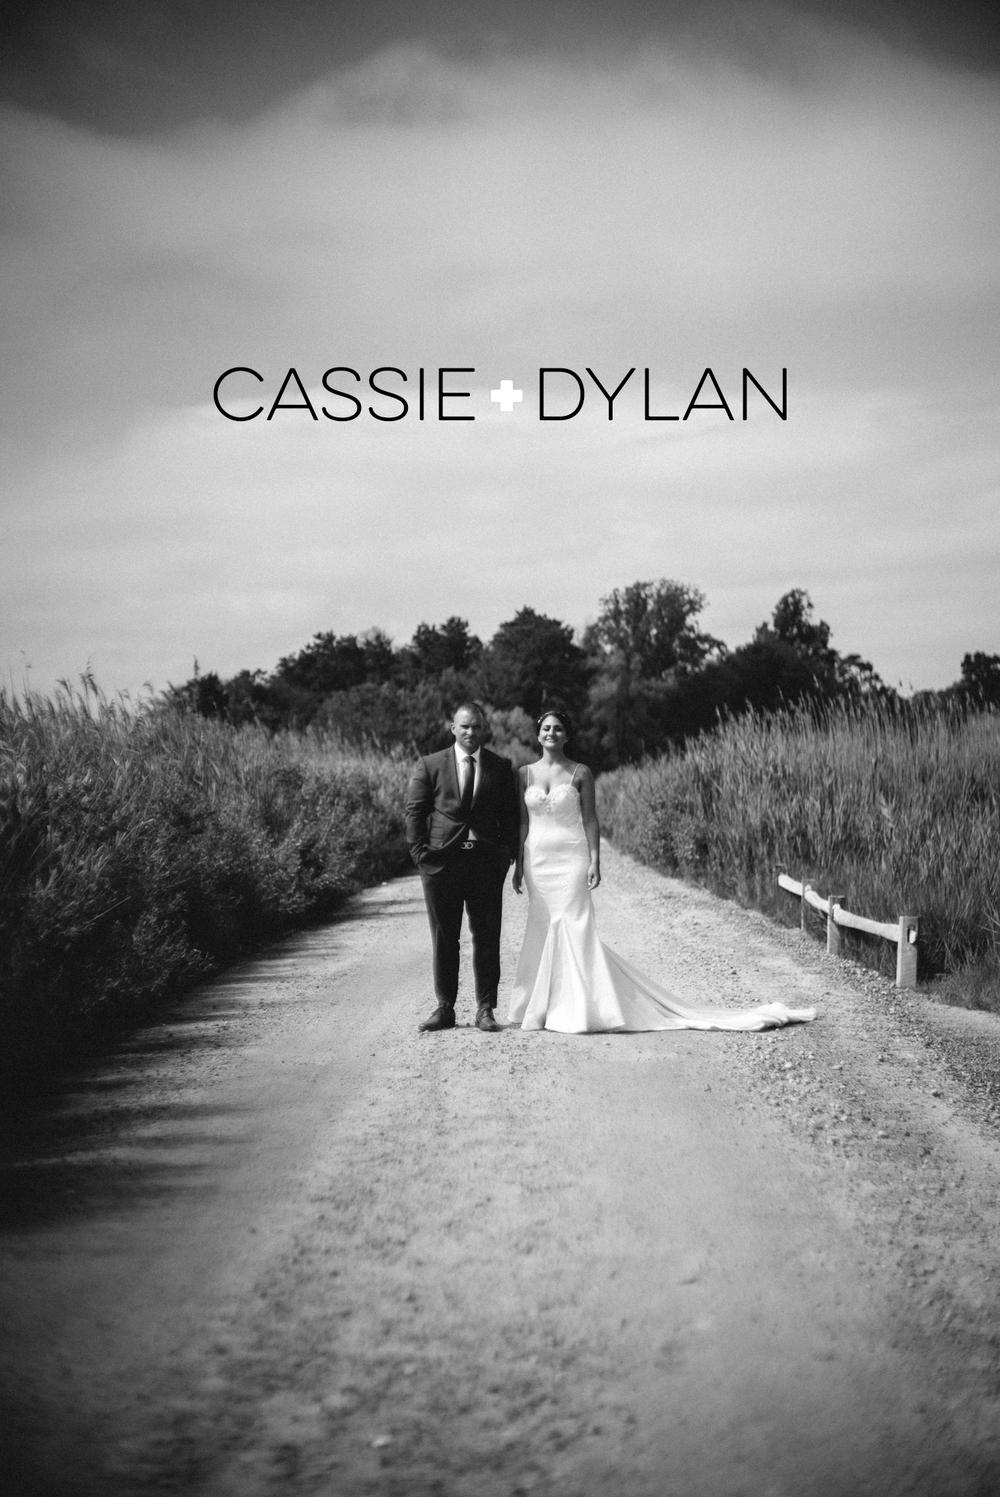 CASSIE_DYLAN_COVER.jpg